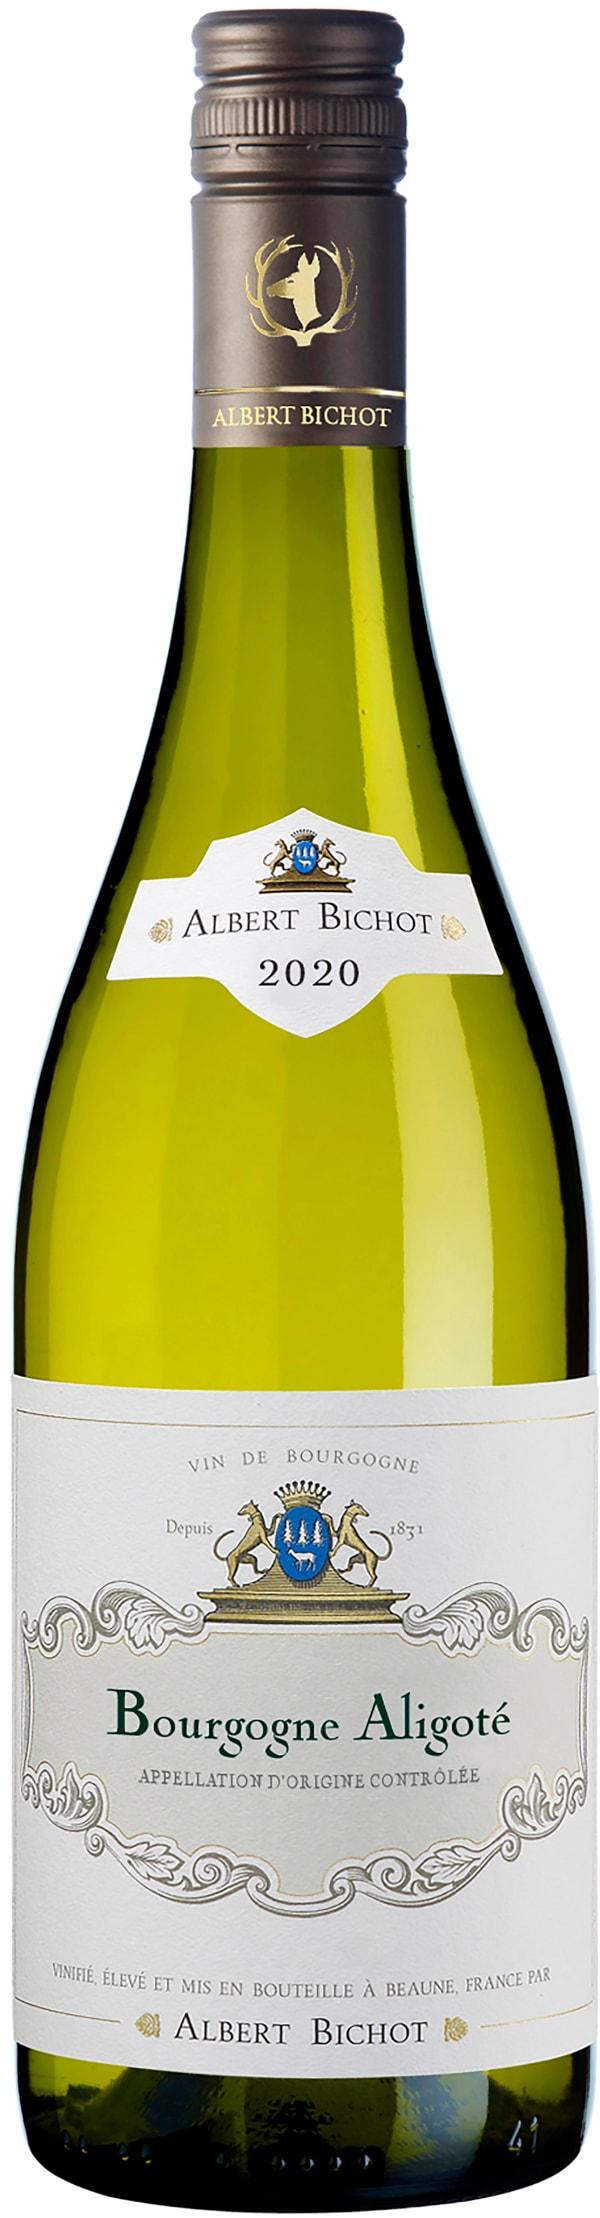 Albert Bichot Bourgogne Aligoté 2018